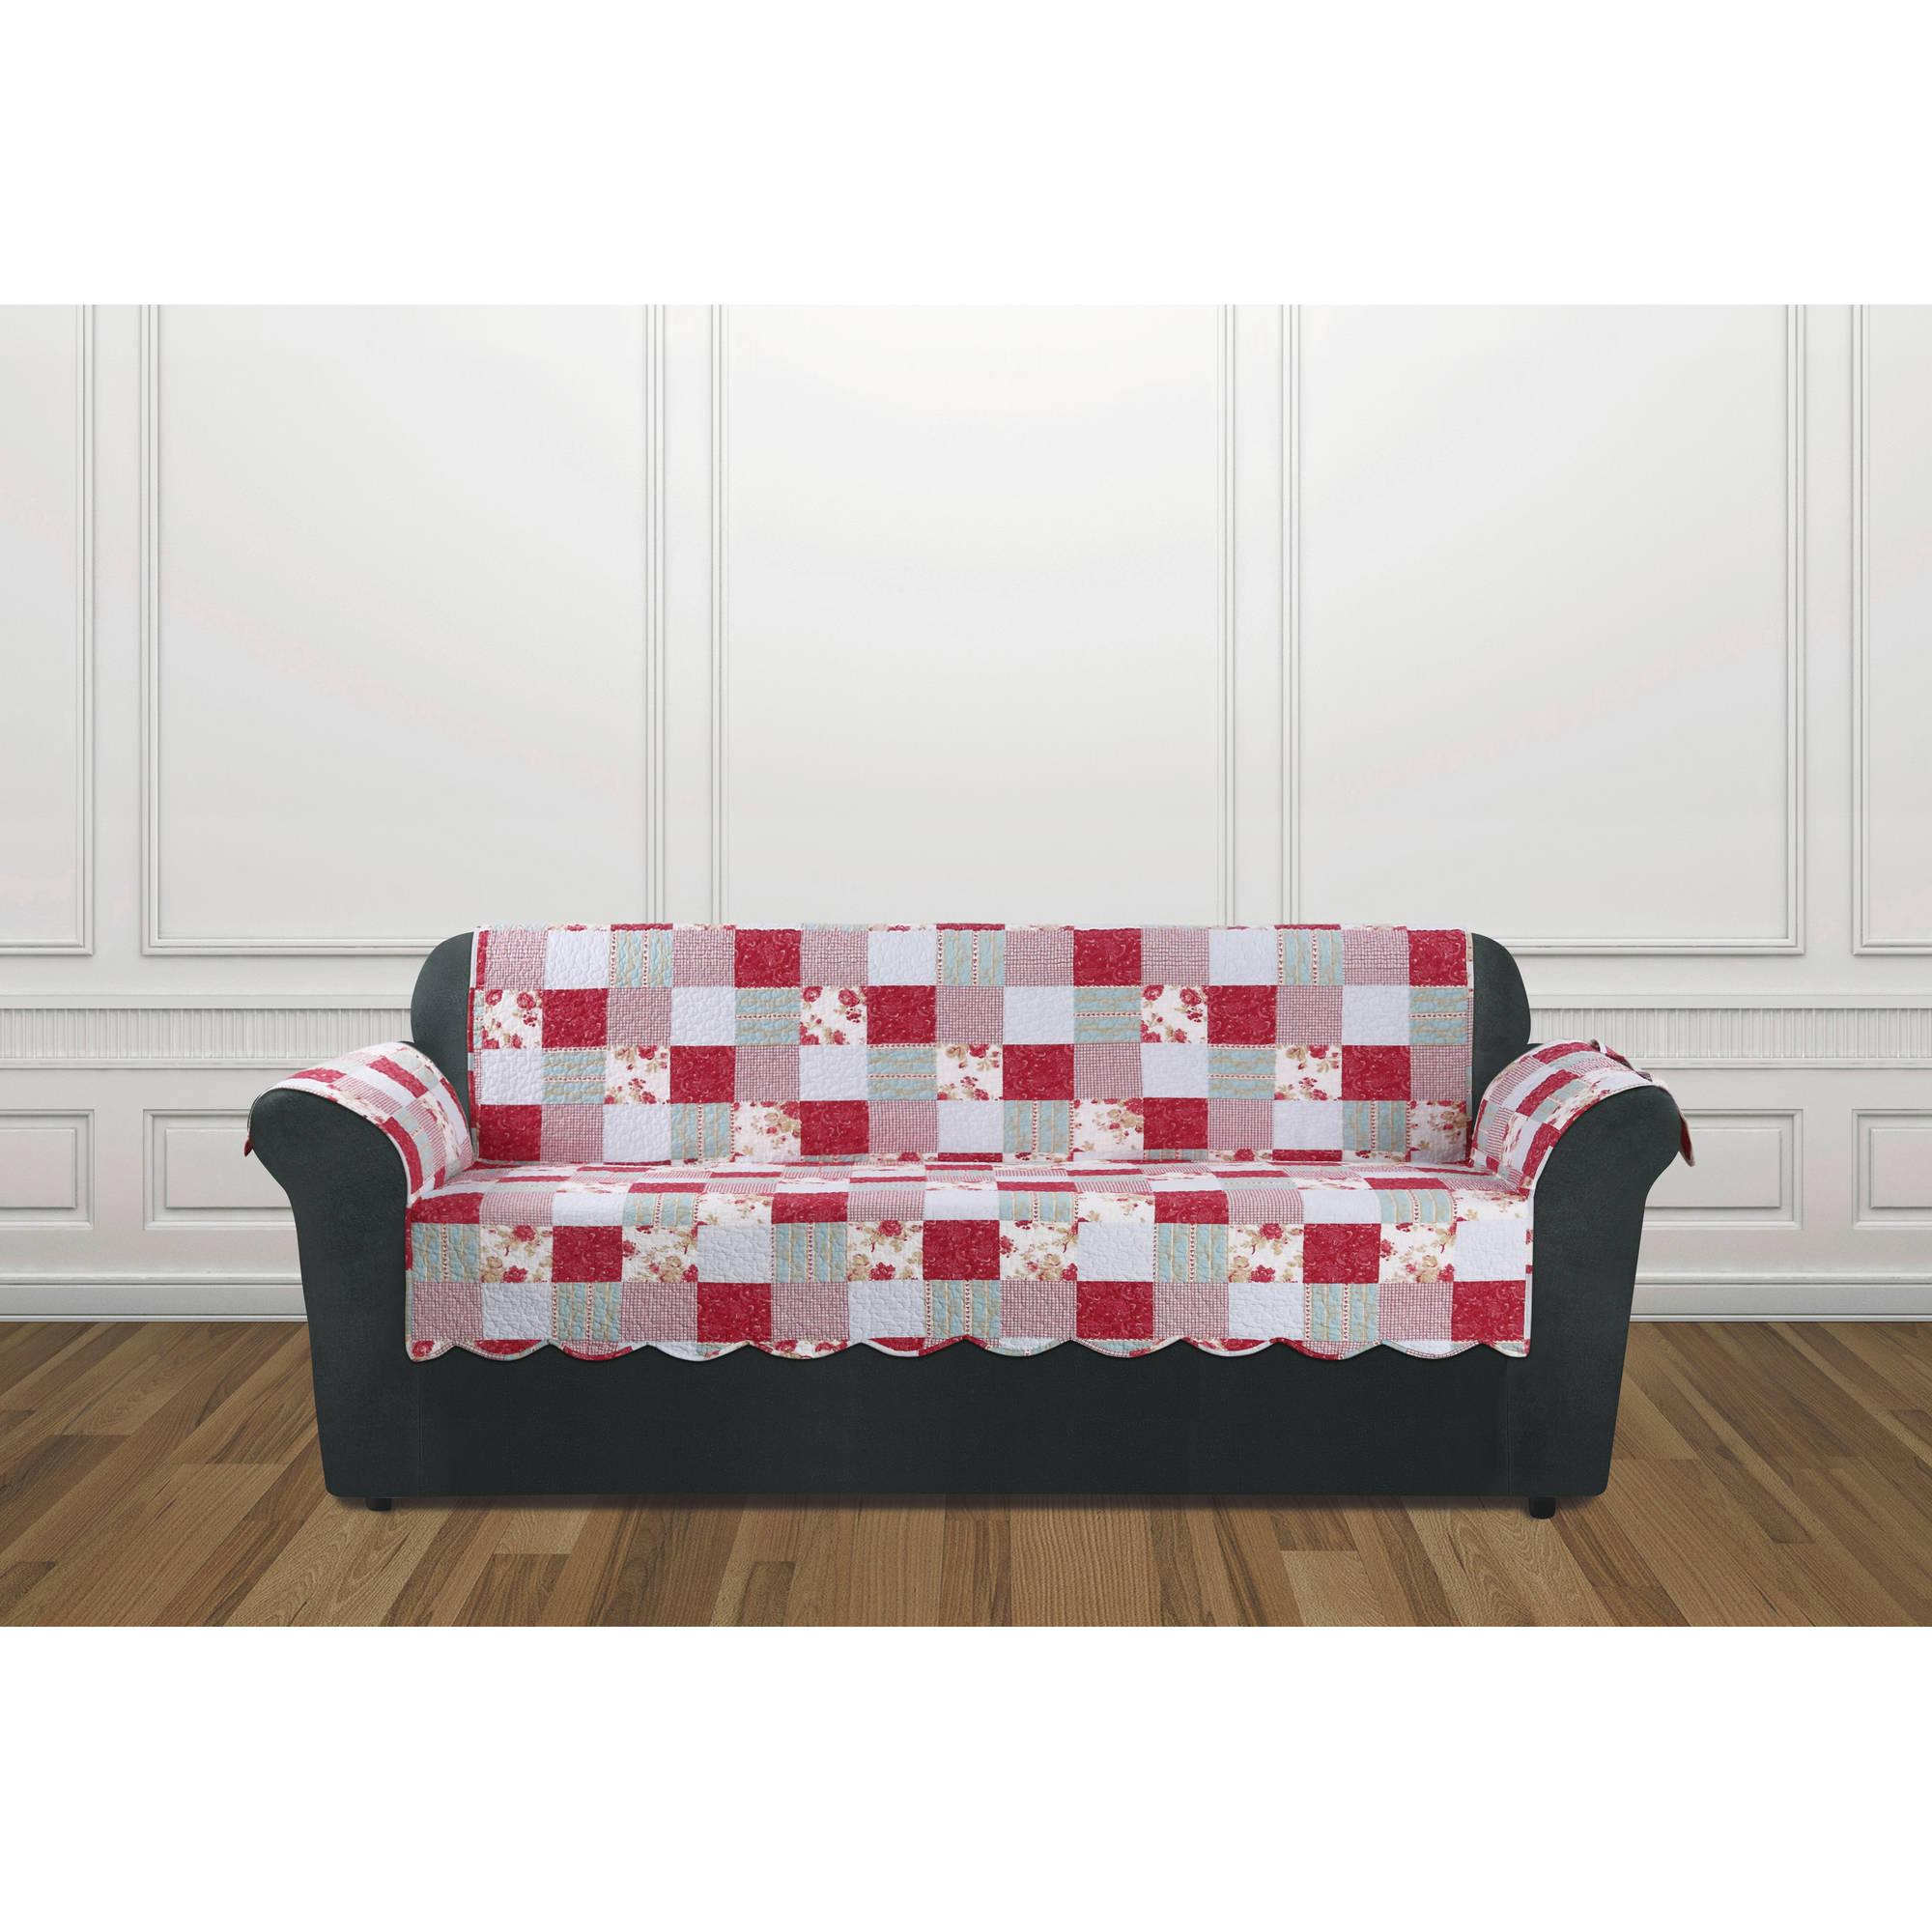 Sure Fit Heirloom Furniture Pet Sofa Cover